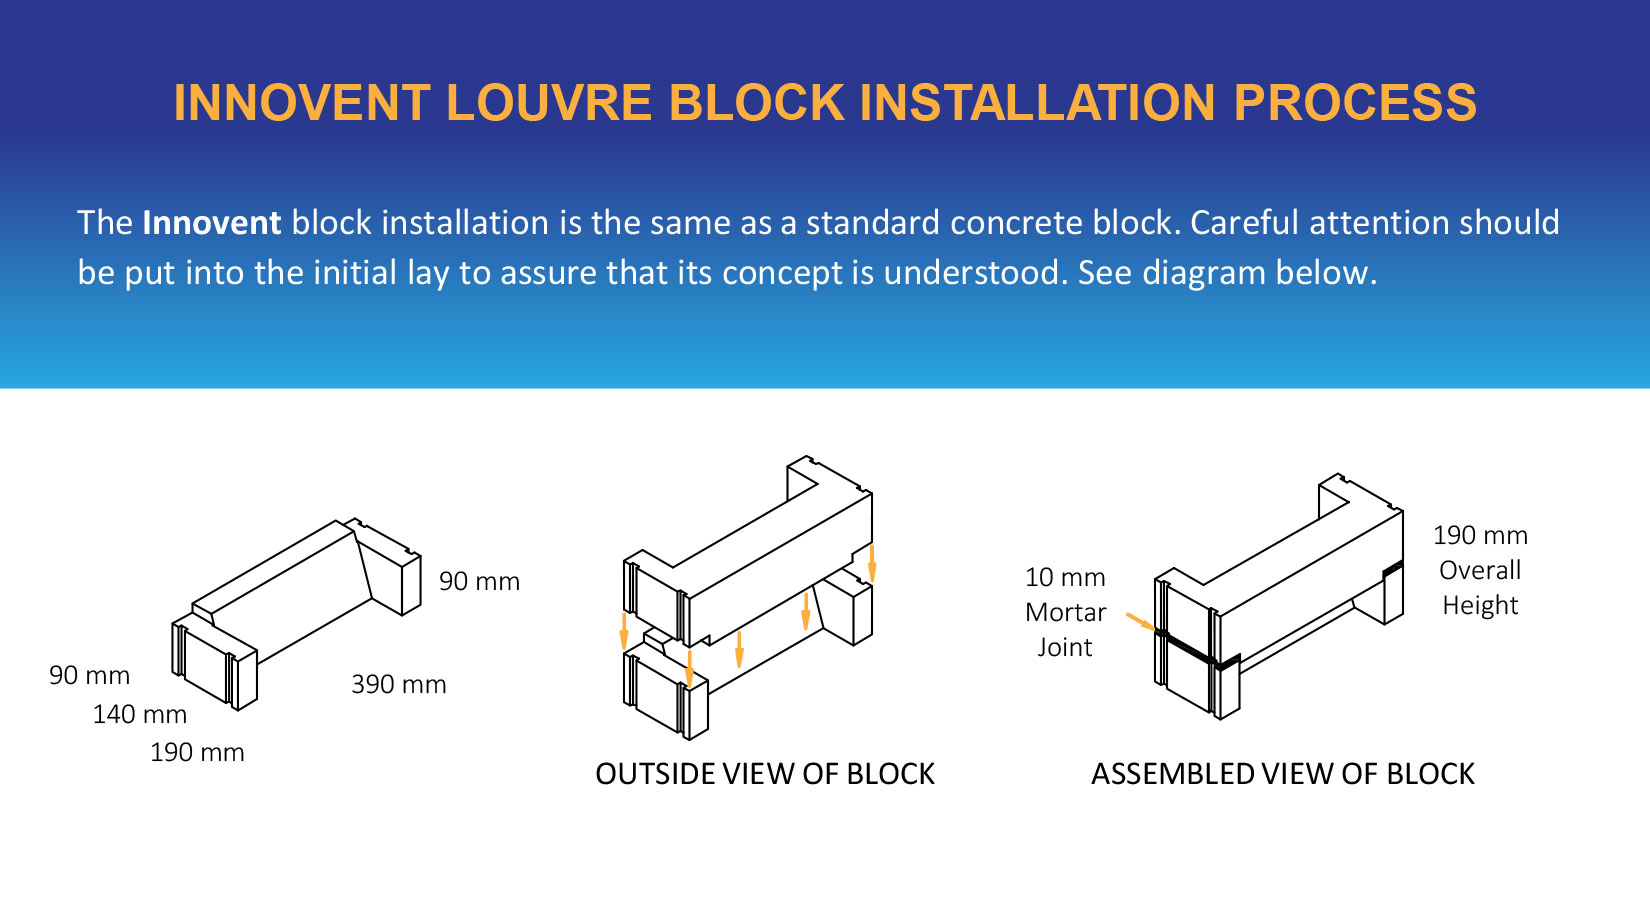 Innovent Louvre Block Installation Process